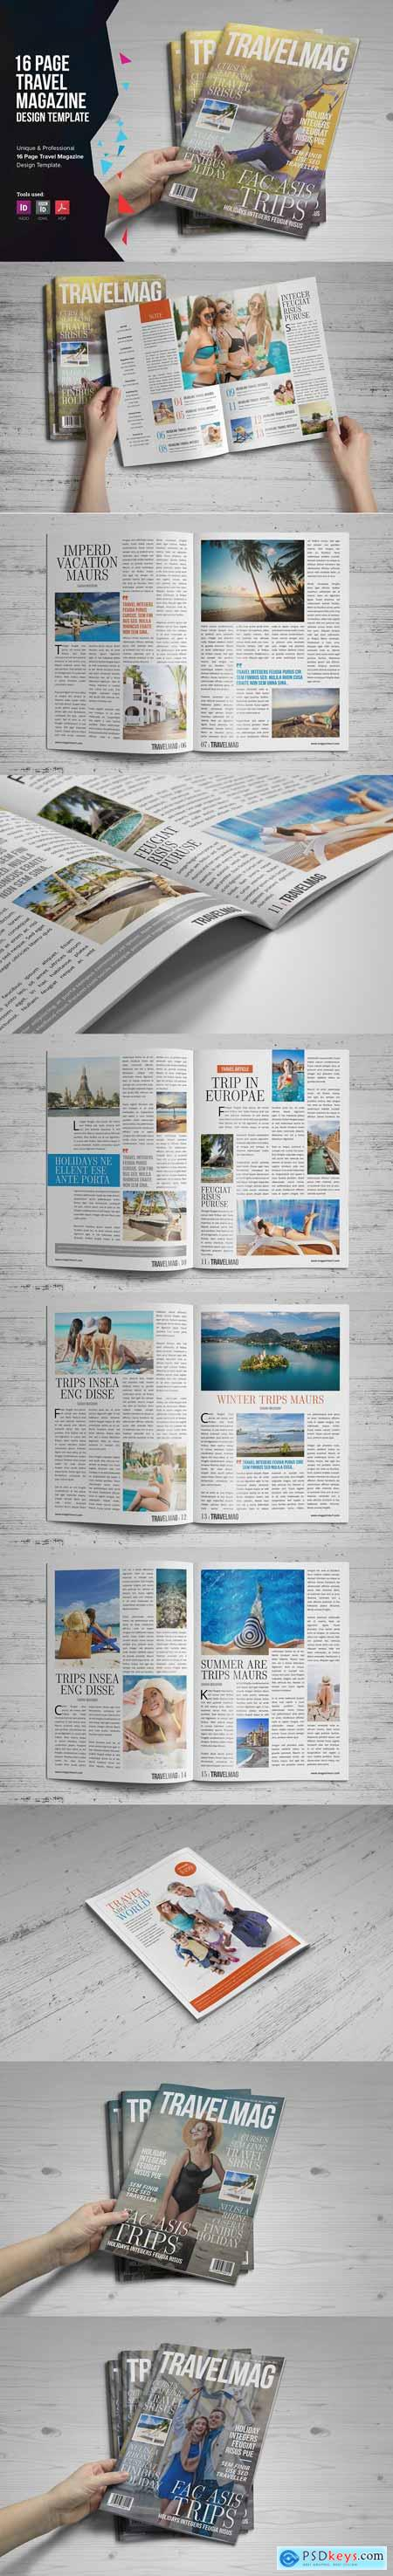 Travel Magazine Design 2744857